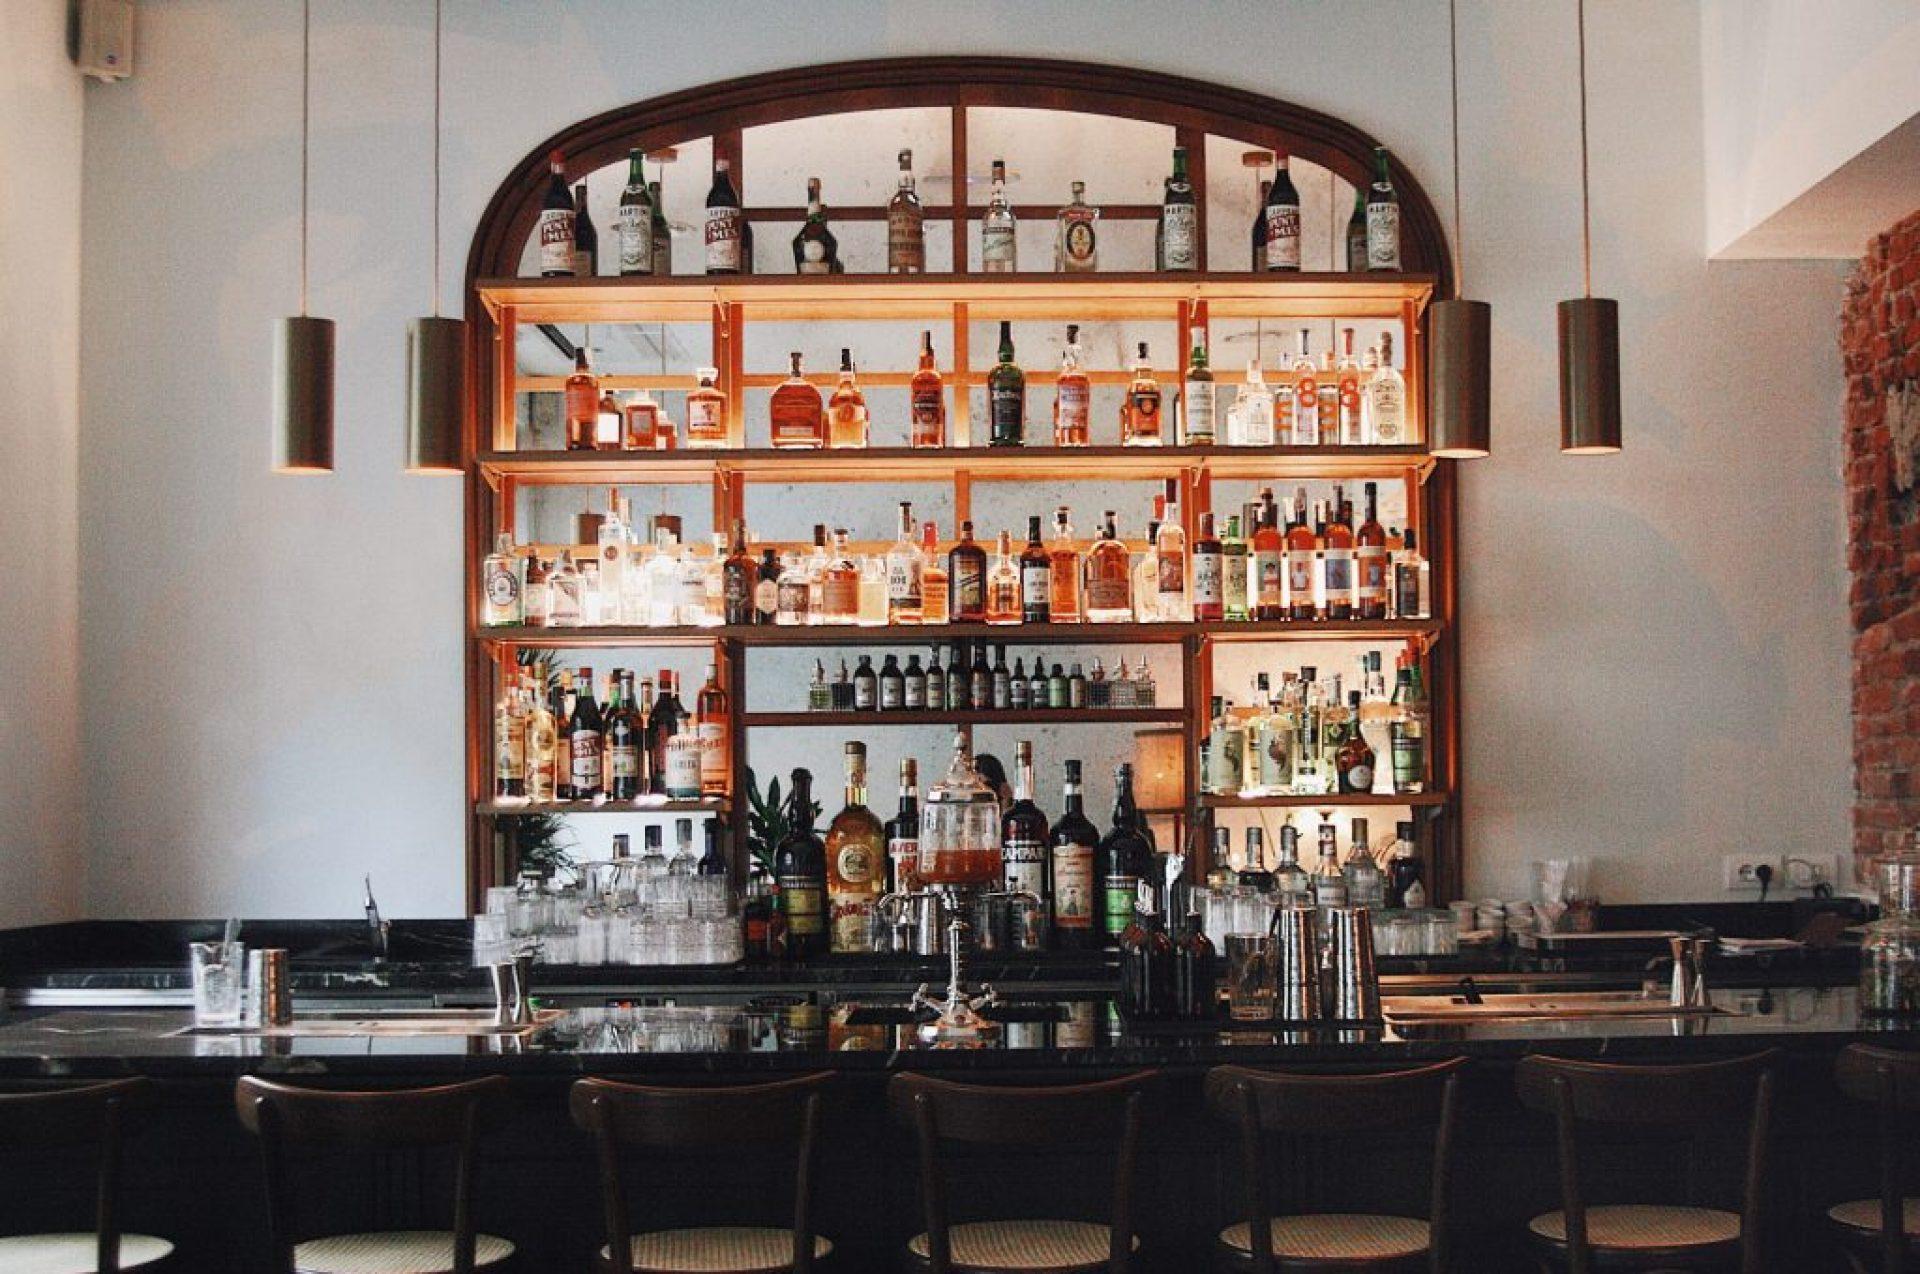 Giolina-cocktail-bar-1-1024x680-1920x1274